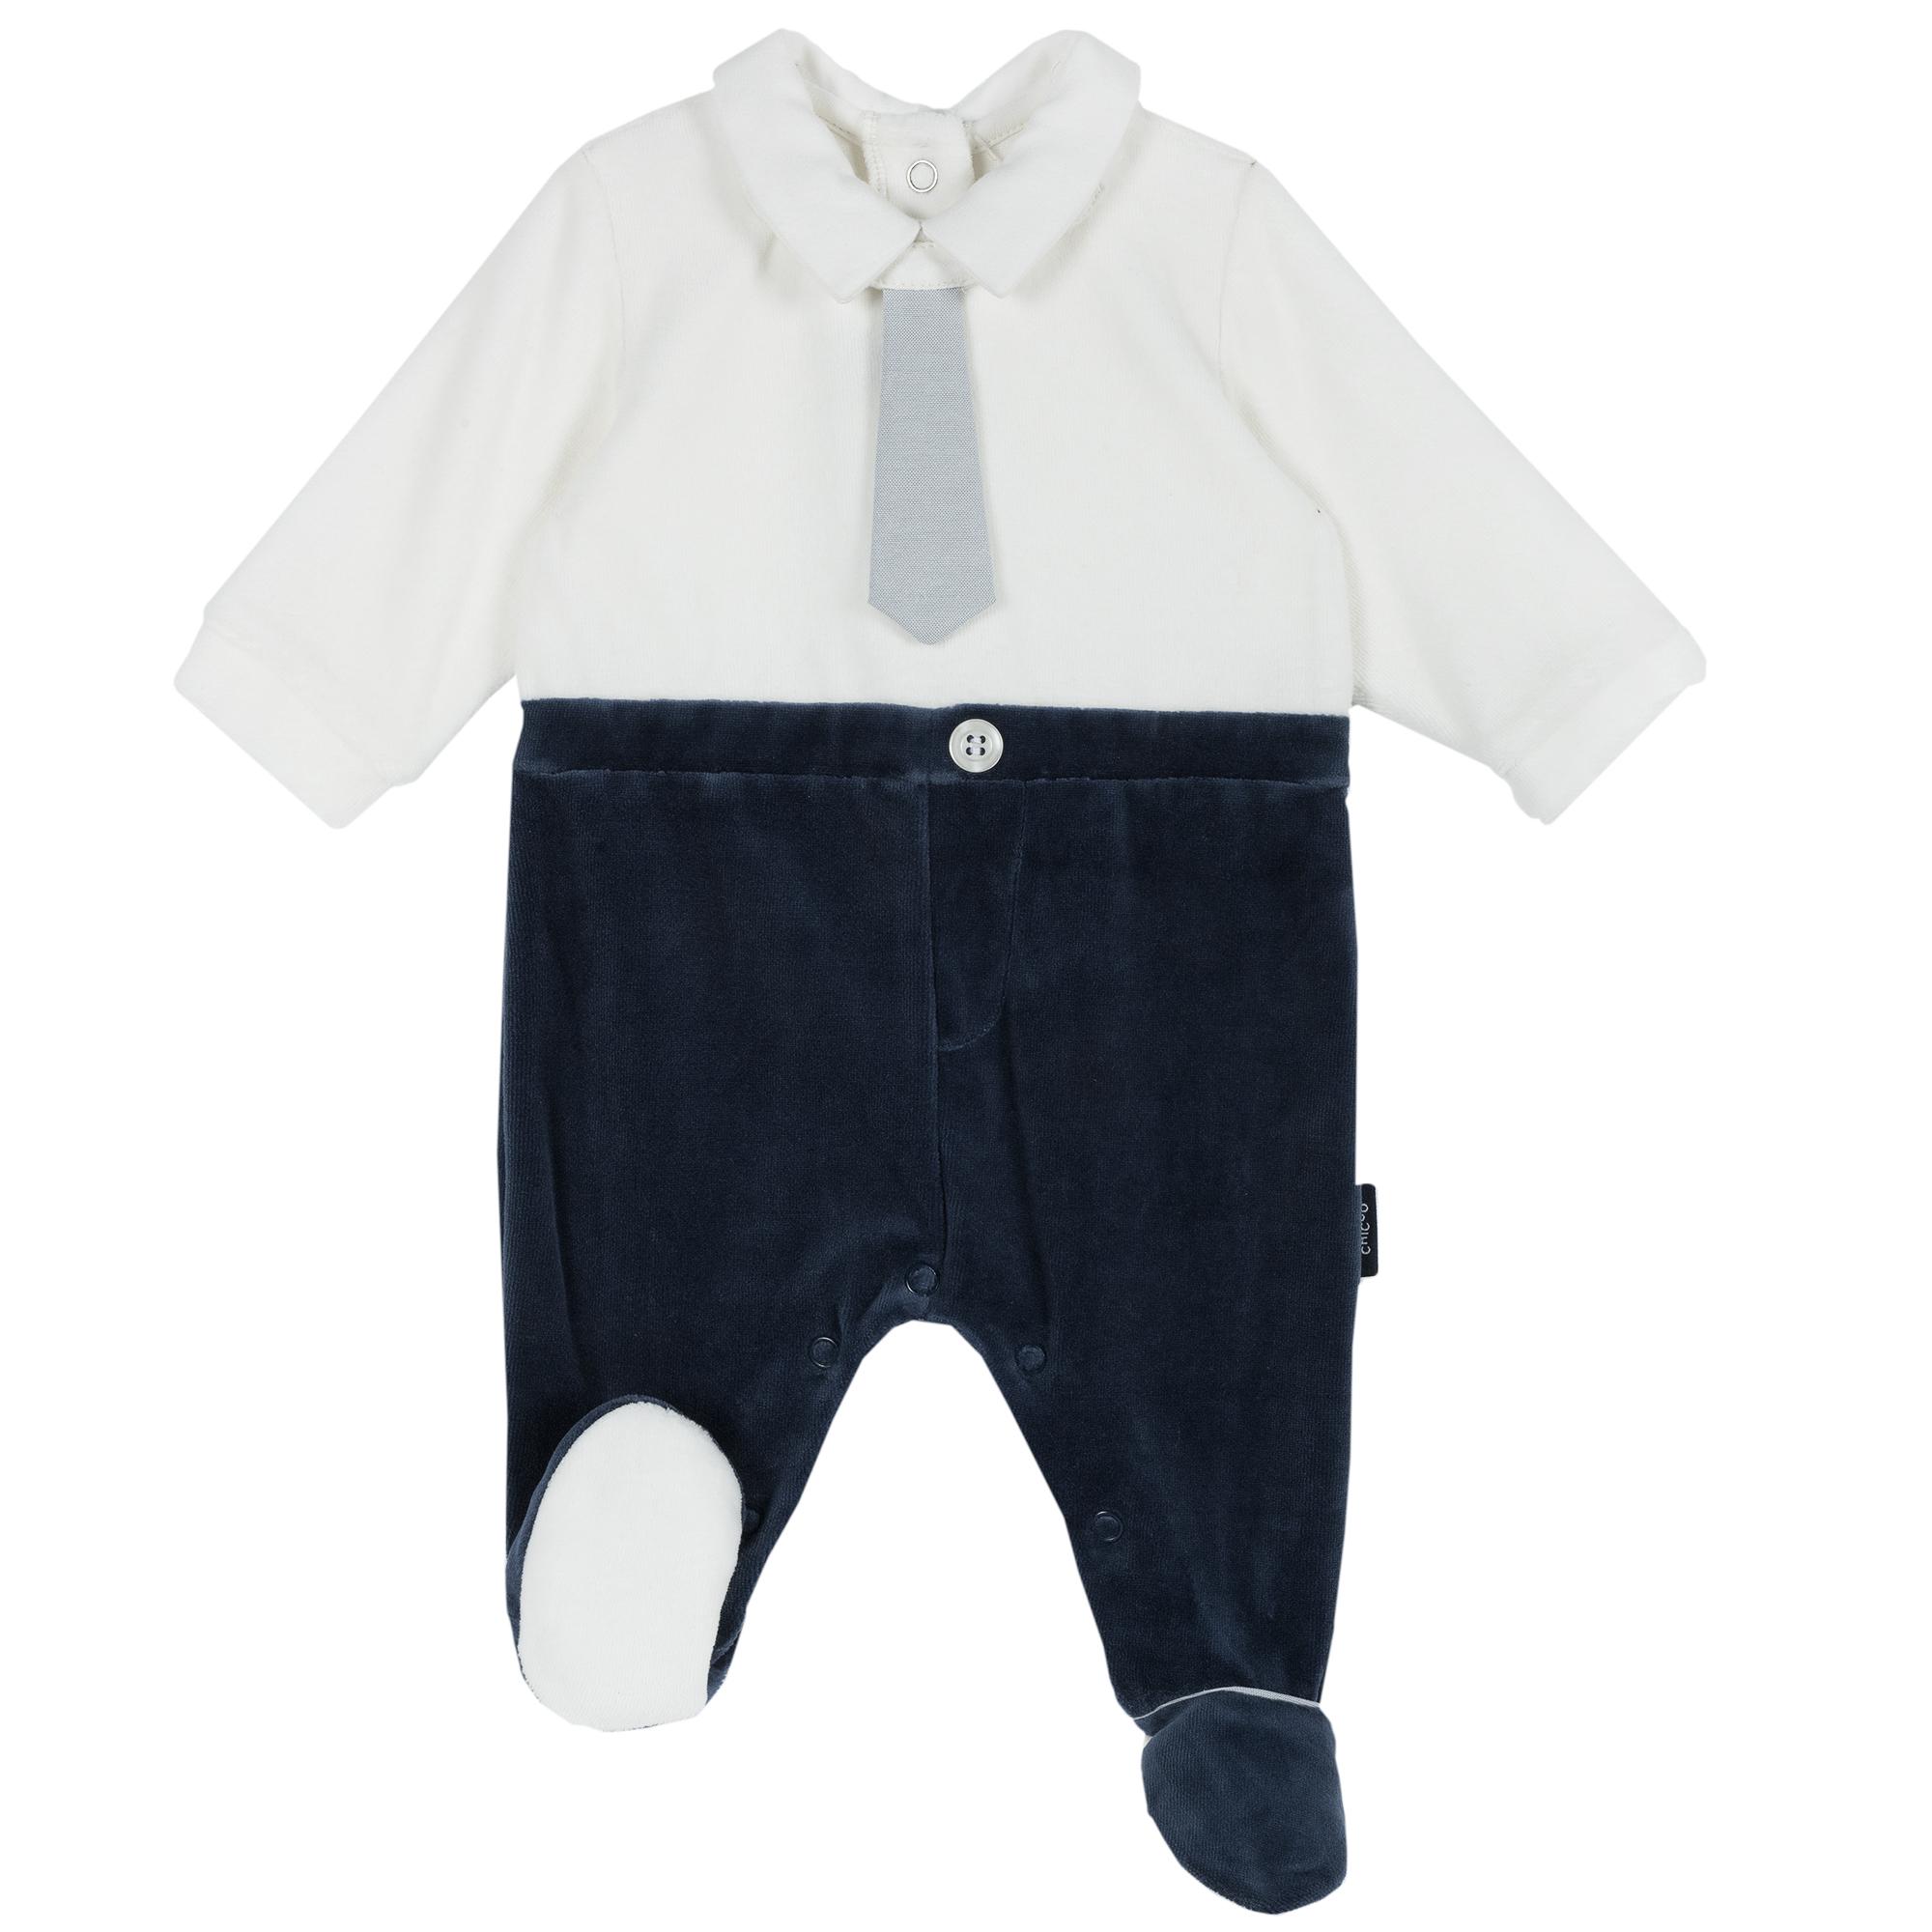 Salopeta copii Chicco alb cu bleumarin 62